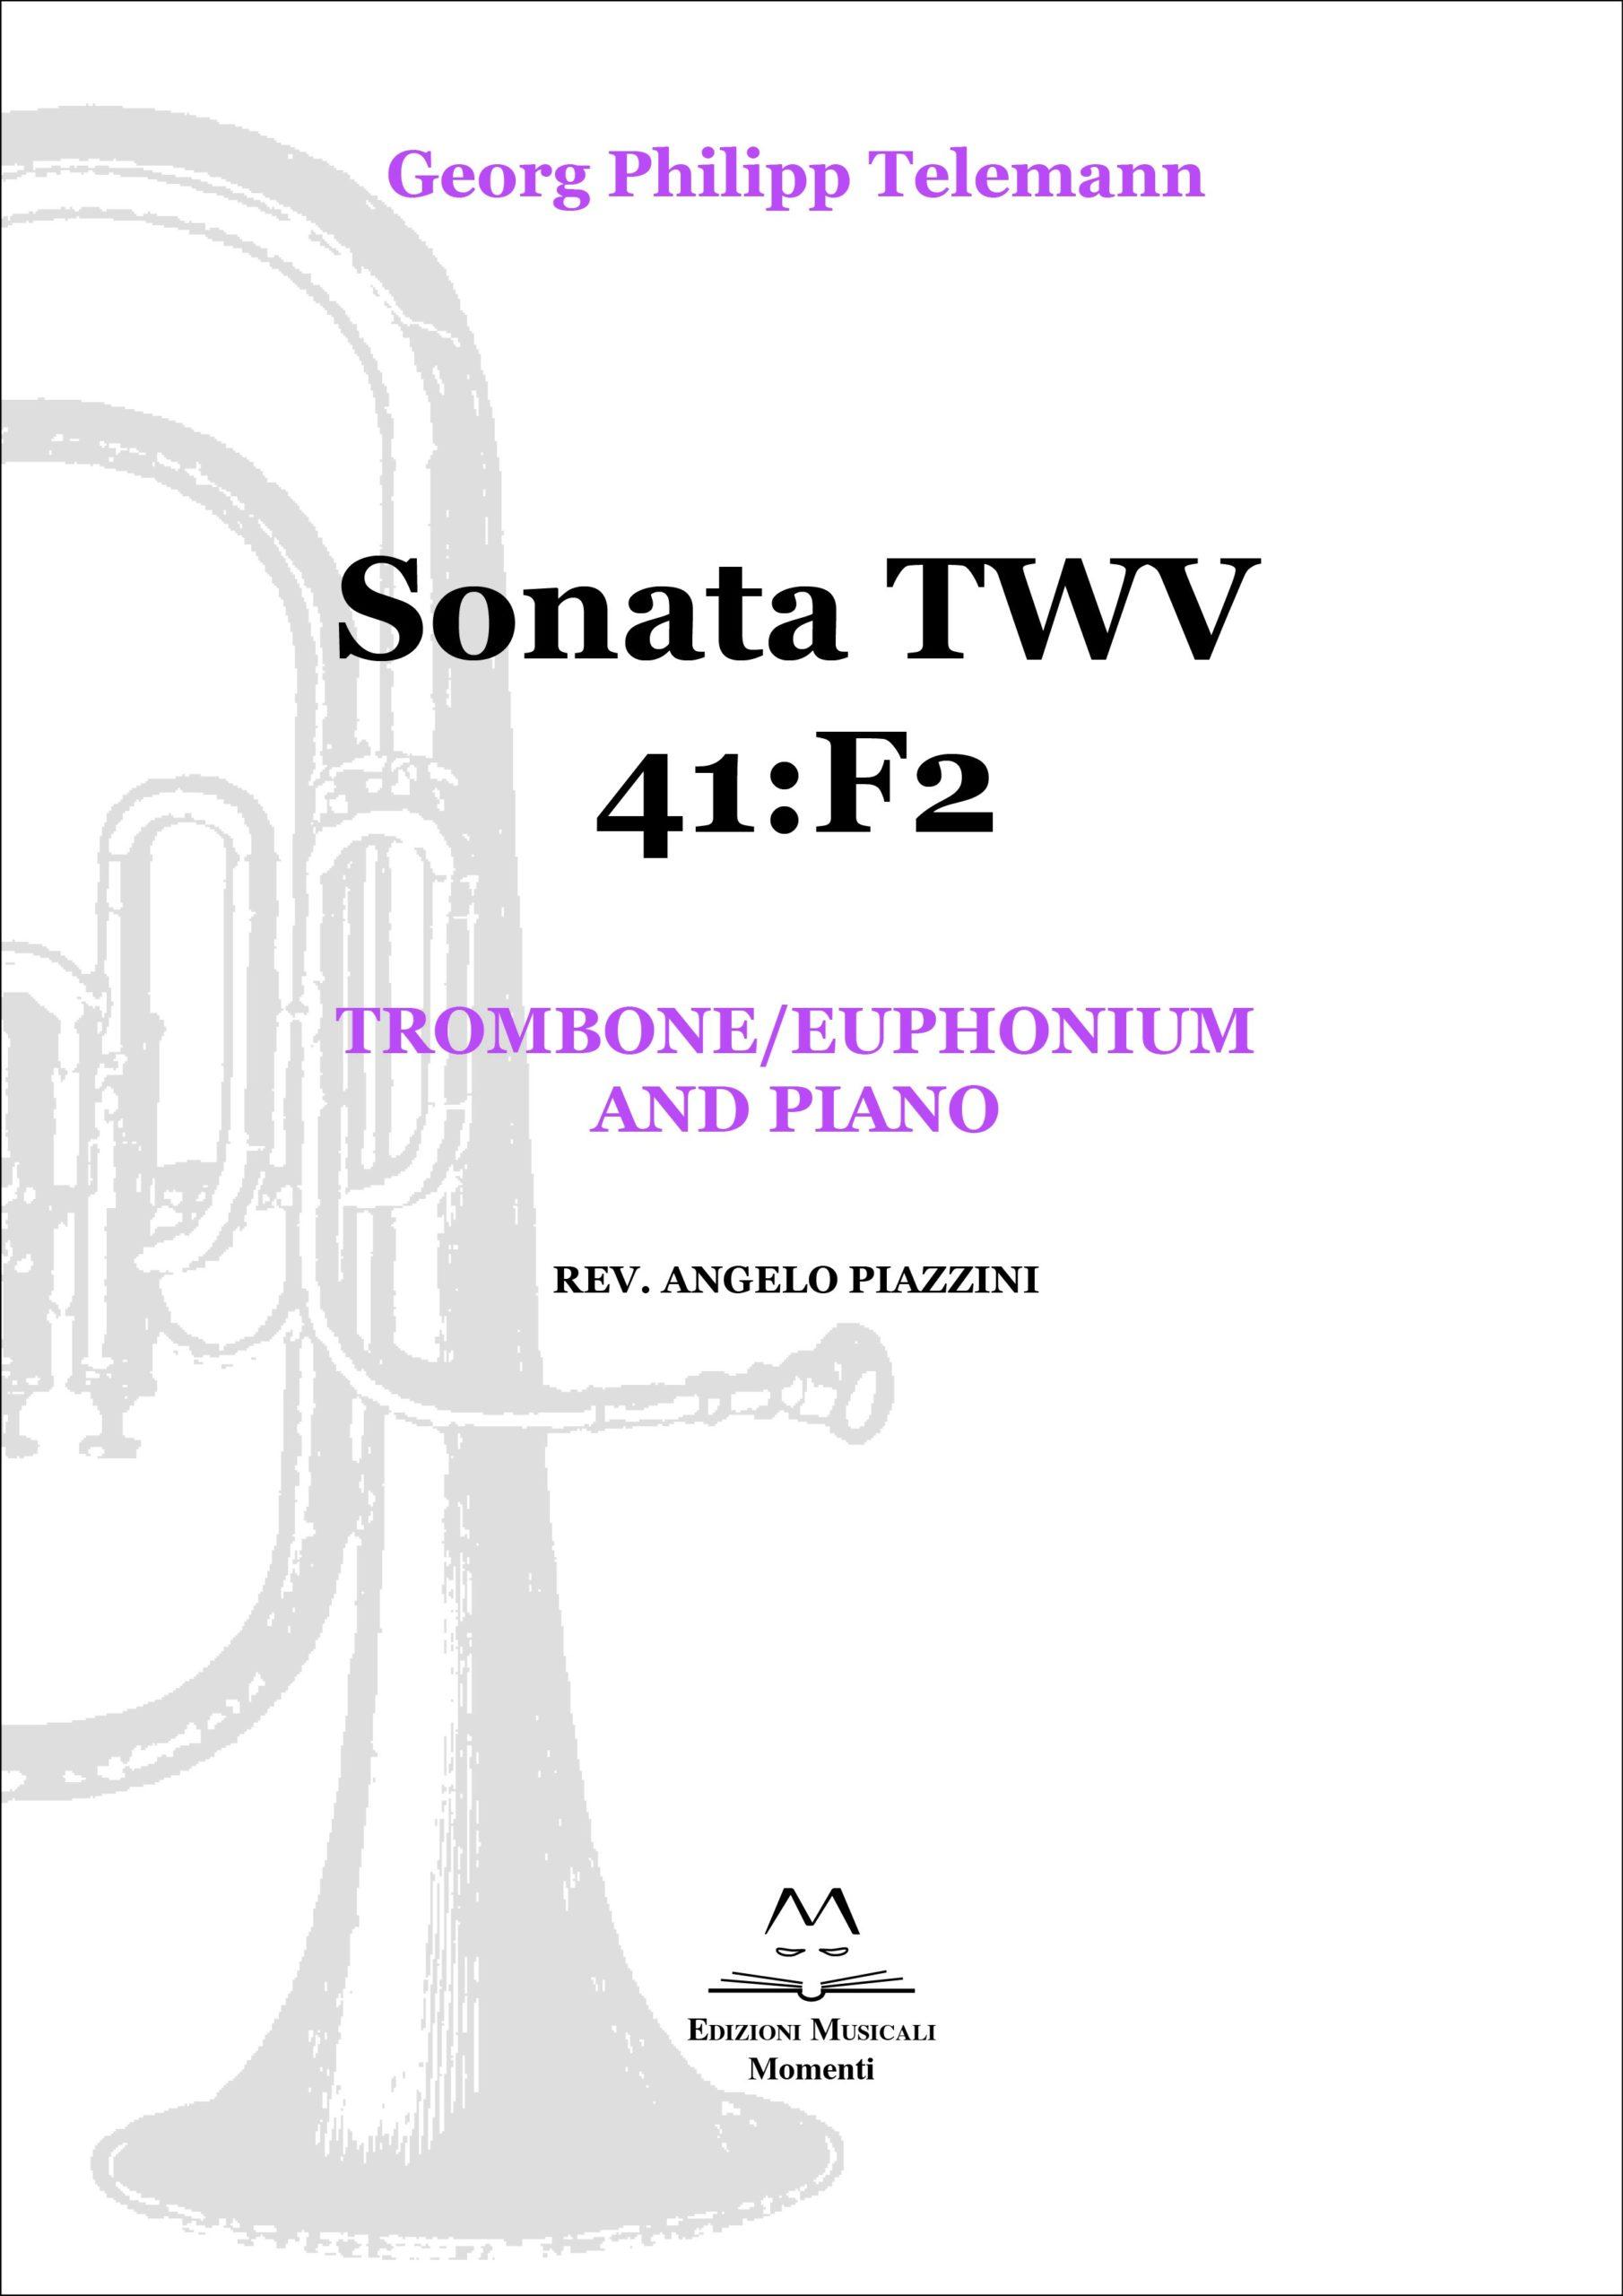 Sonata TWV 41:F2 - Trombone/euphonium and piano rev. Angelo Piazzini